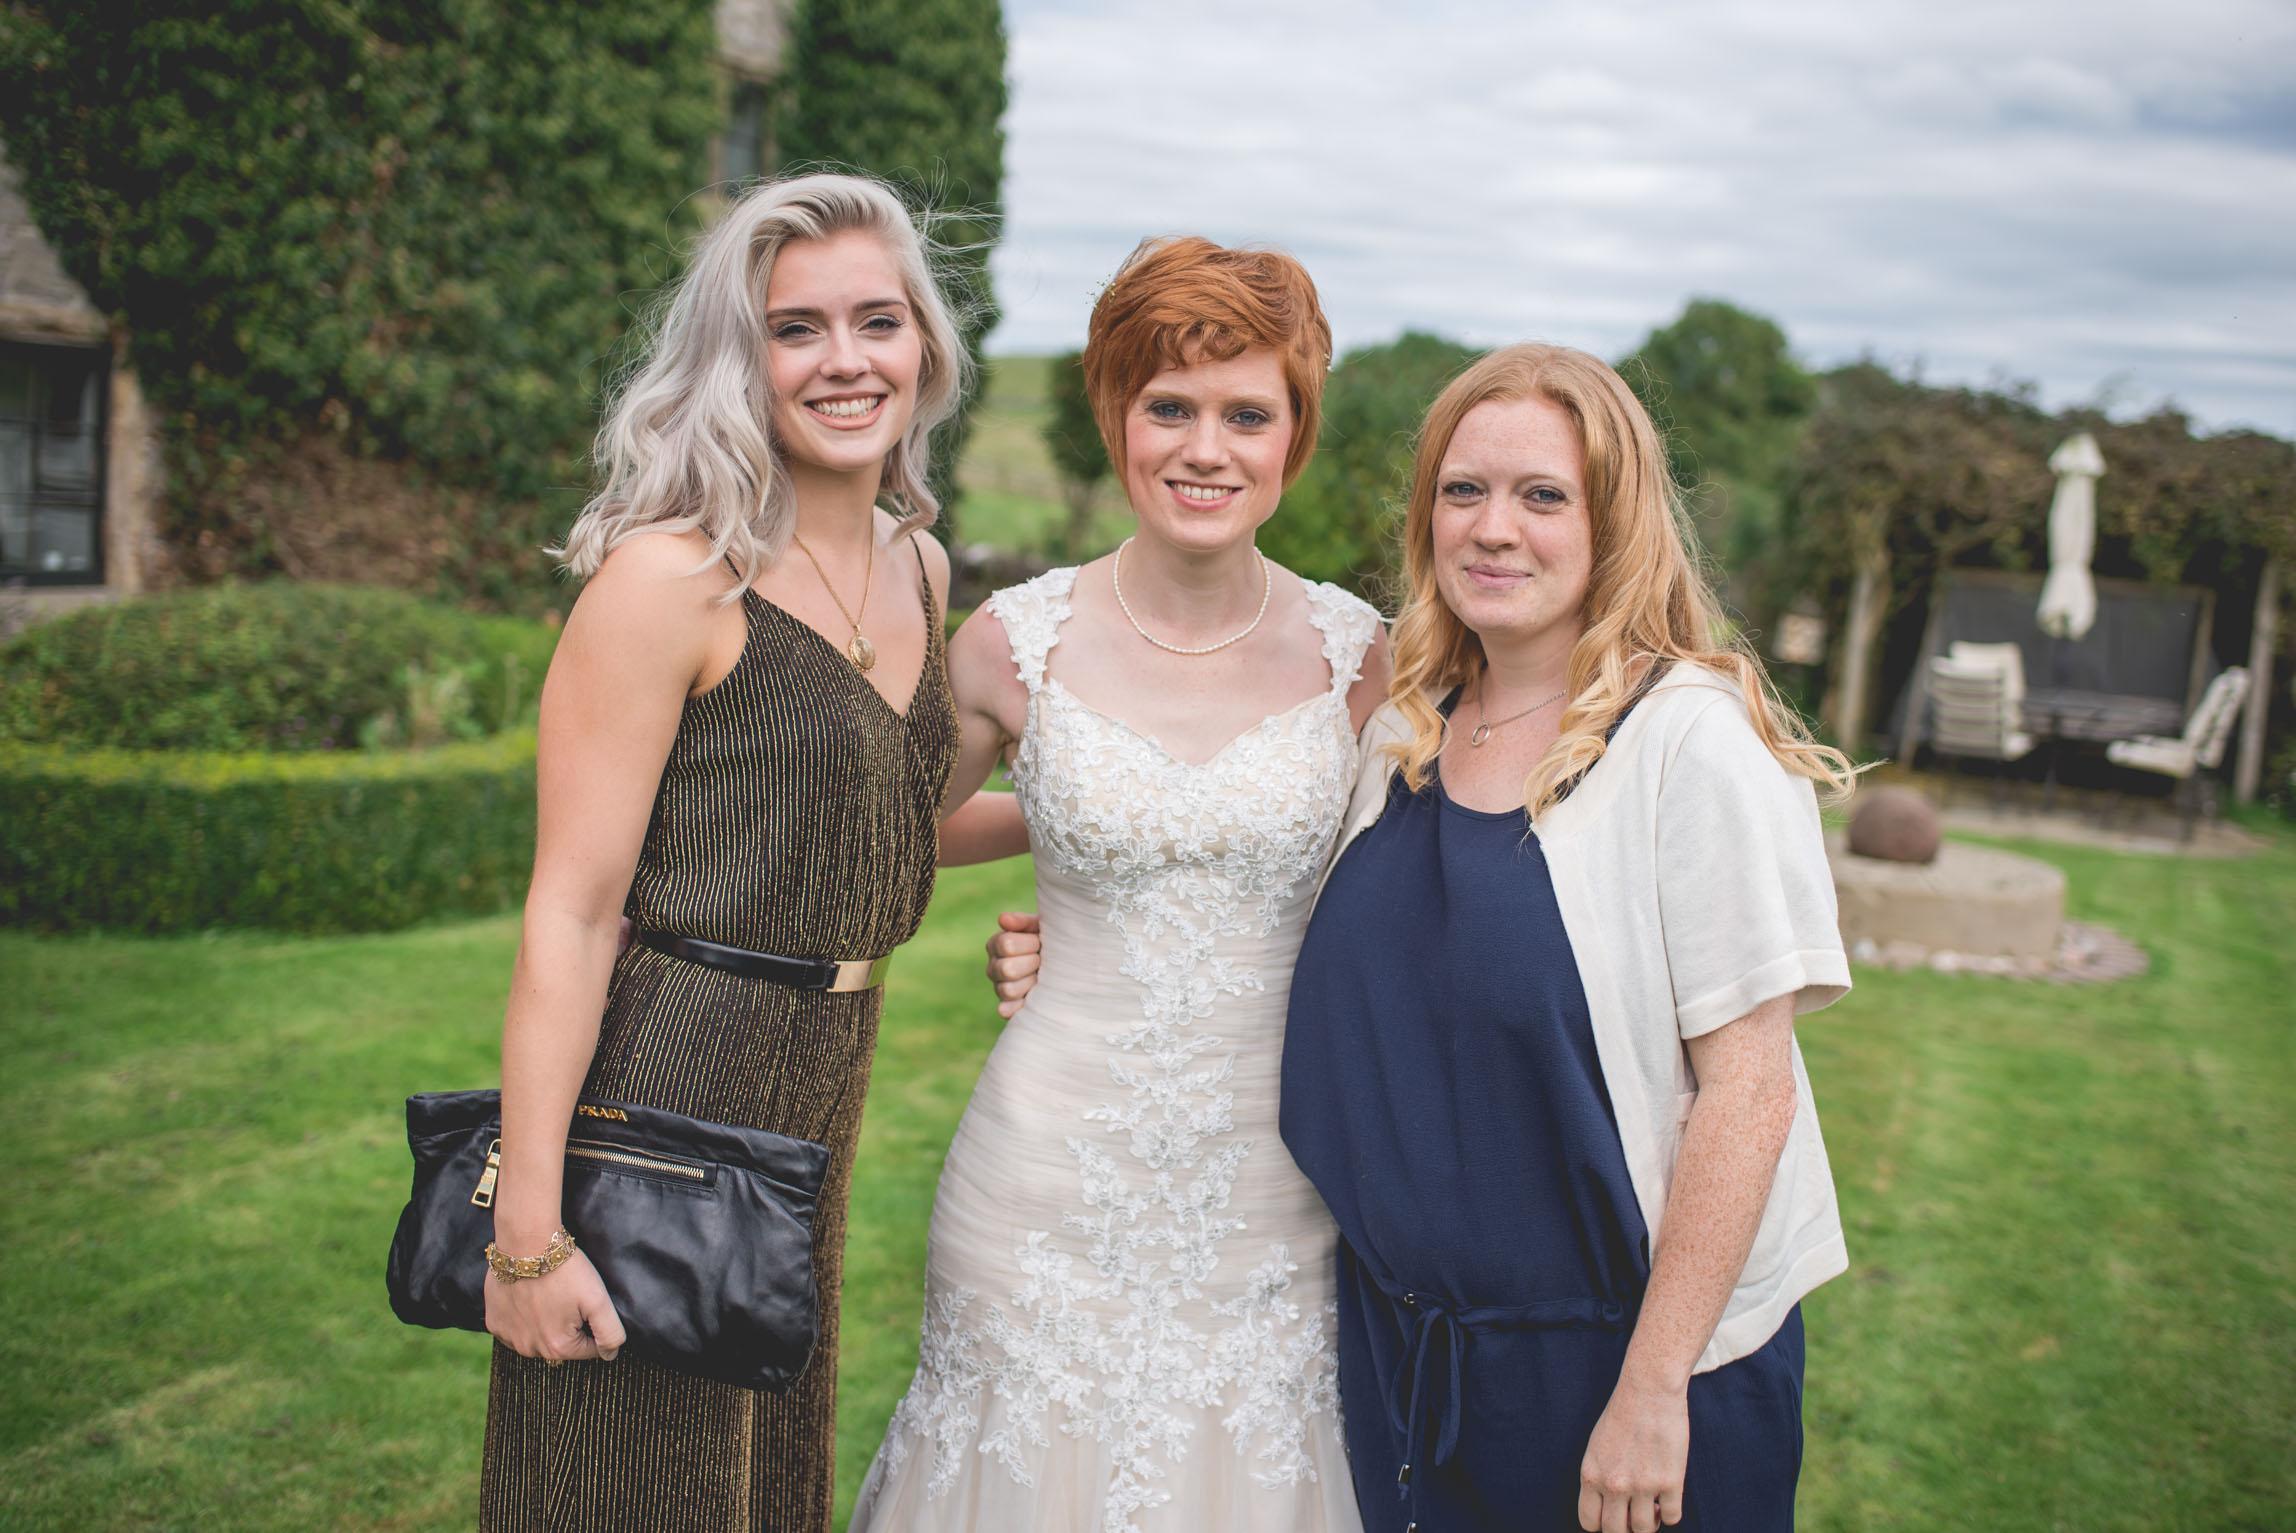 Peak+district+farm+wedding+lower+damgate+photographer-95.jpg